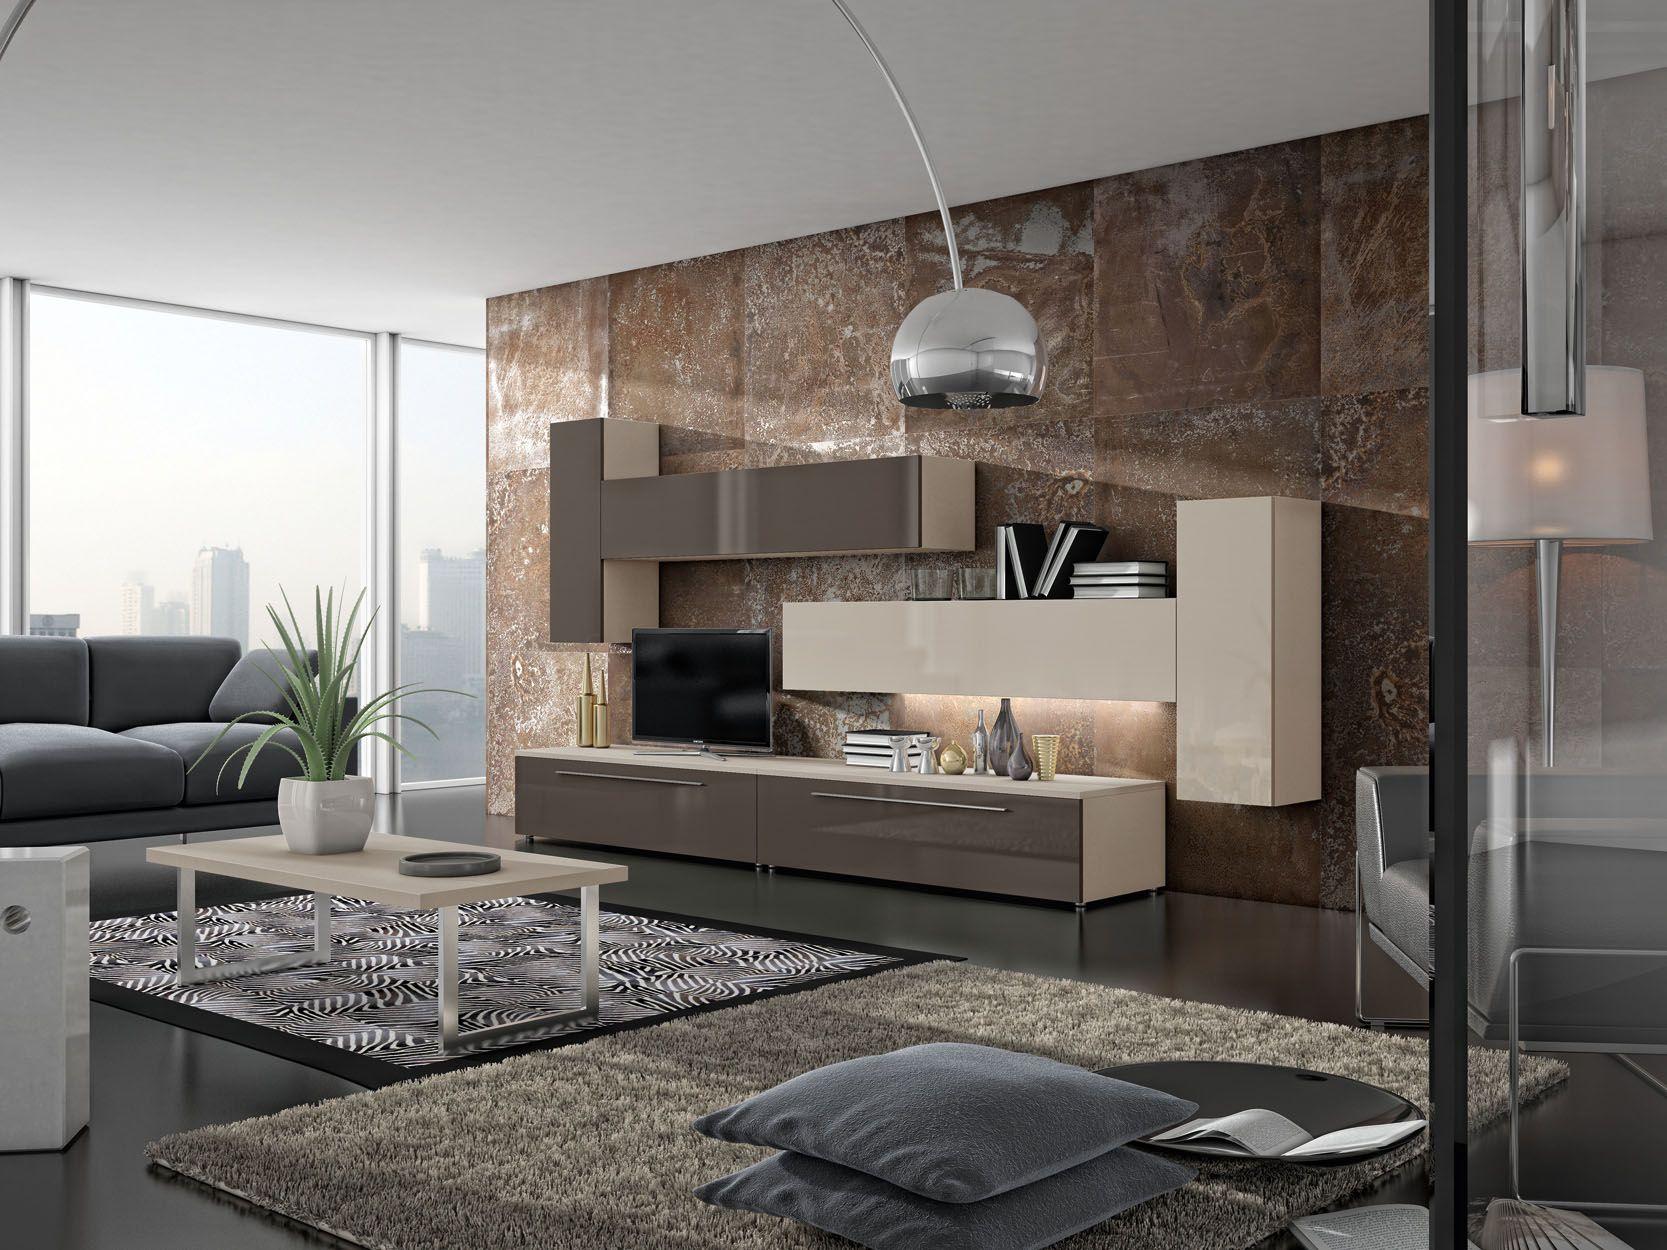 Mueble Moderno De Sala Awesome Interiors Pinterest Muebles  # Muebles Filadelfia Para Estetica